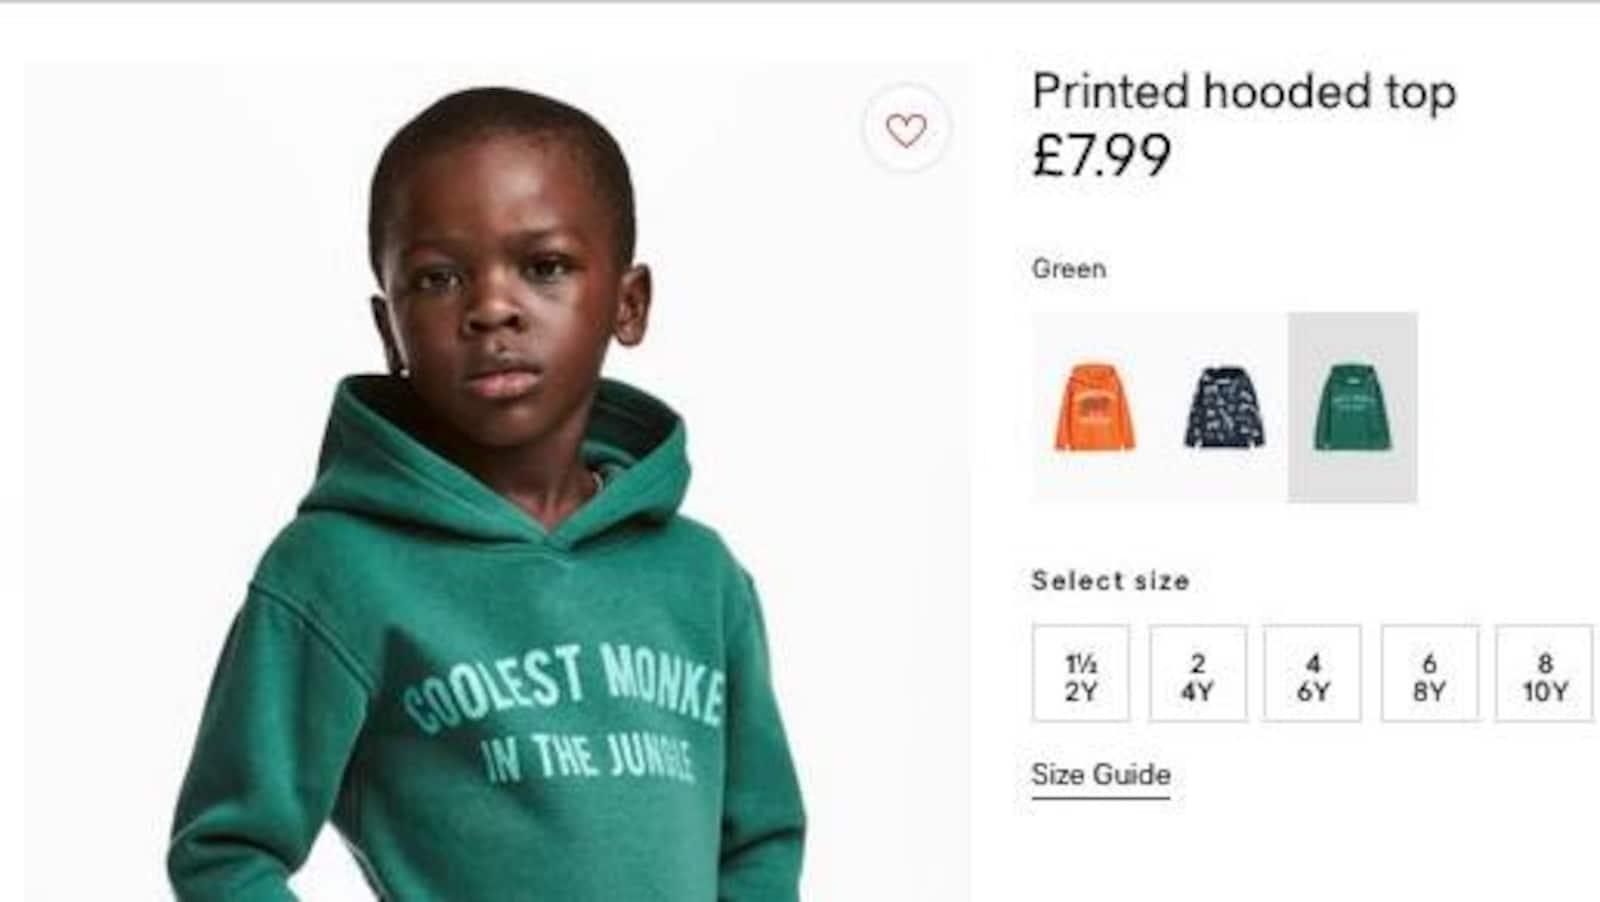 Photographie d'un jeune garçon noir portant un chandail vert.